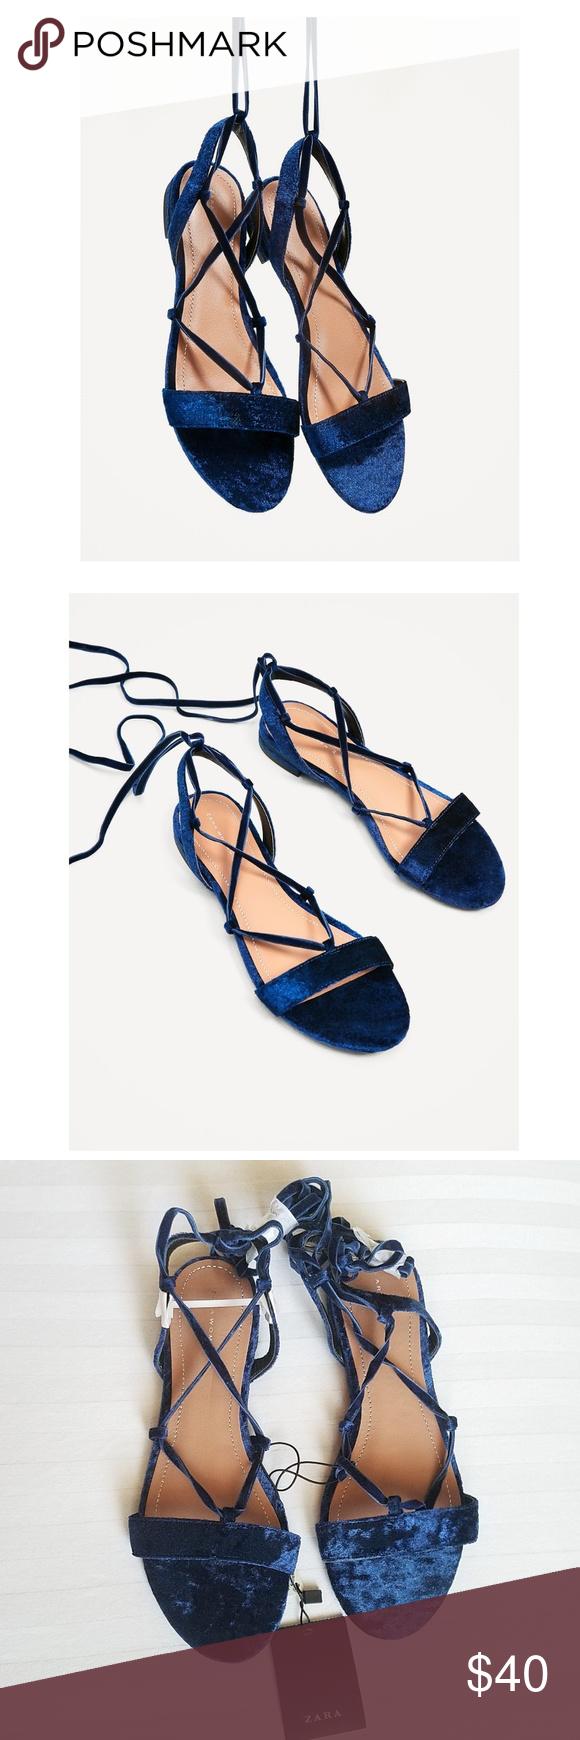 29d413f9a1f0 Zara Velvet Lace Up Gladiators Sandals Boho NWT